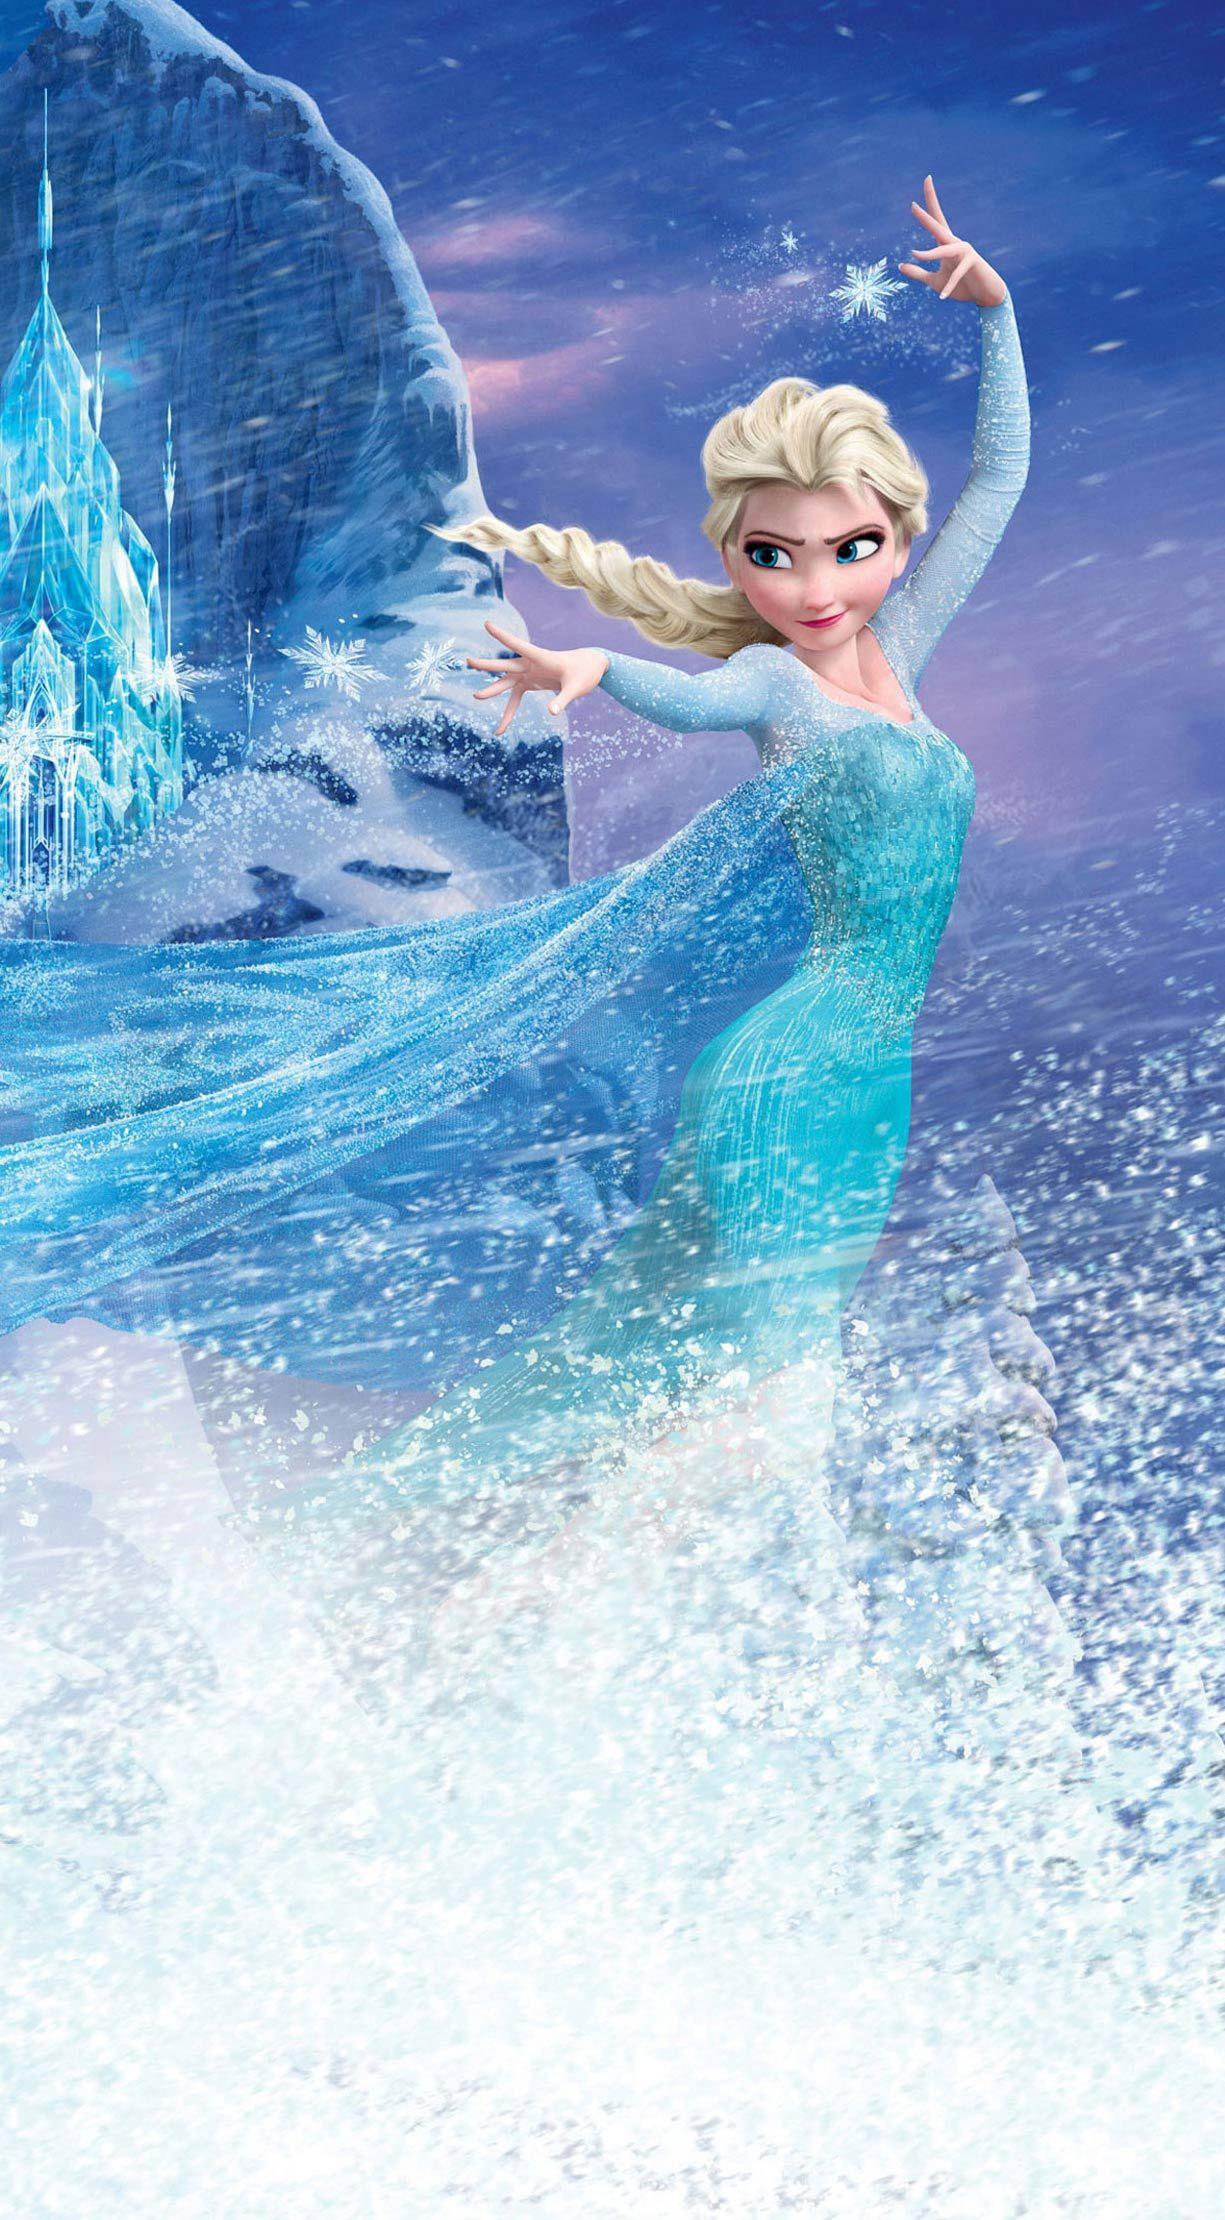 Disney hd widescreen wallpapers elsa kristoff frozen - Wallpaper for frozen ...